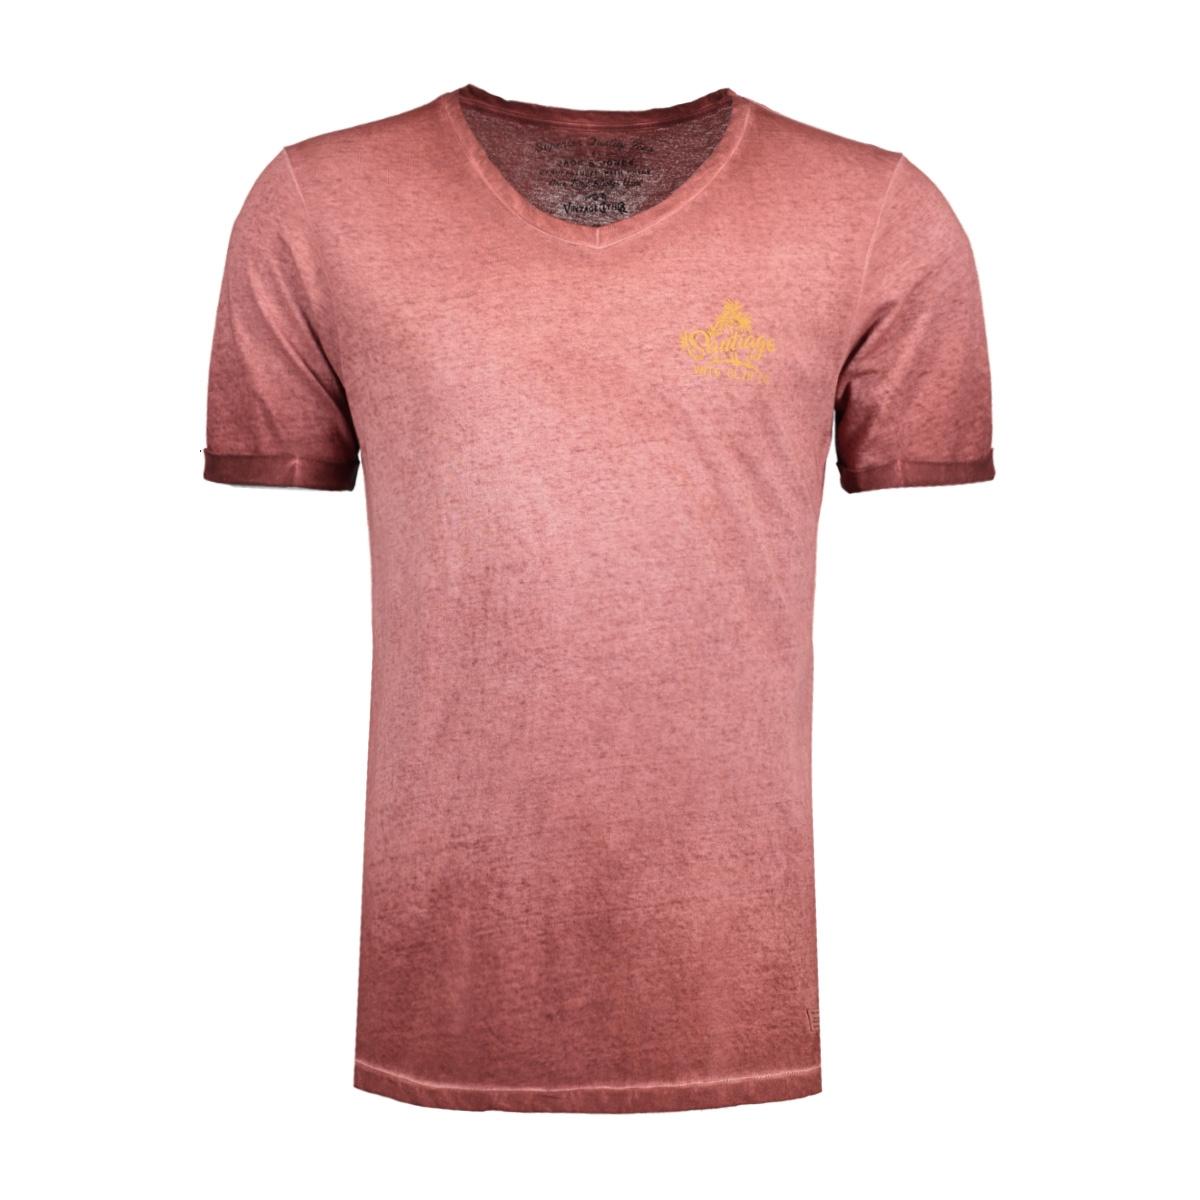 jjvcubansurf ss tee 12132099 jack & jones t-shirt burnt henna